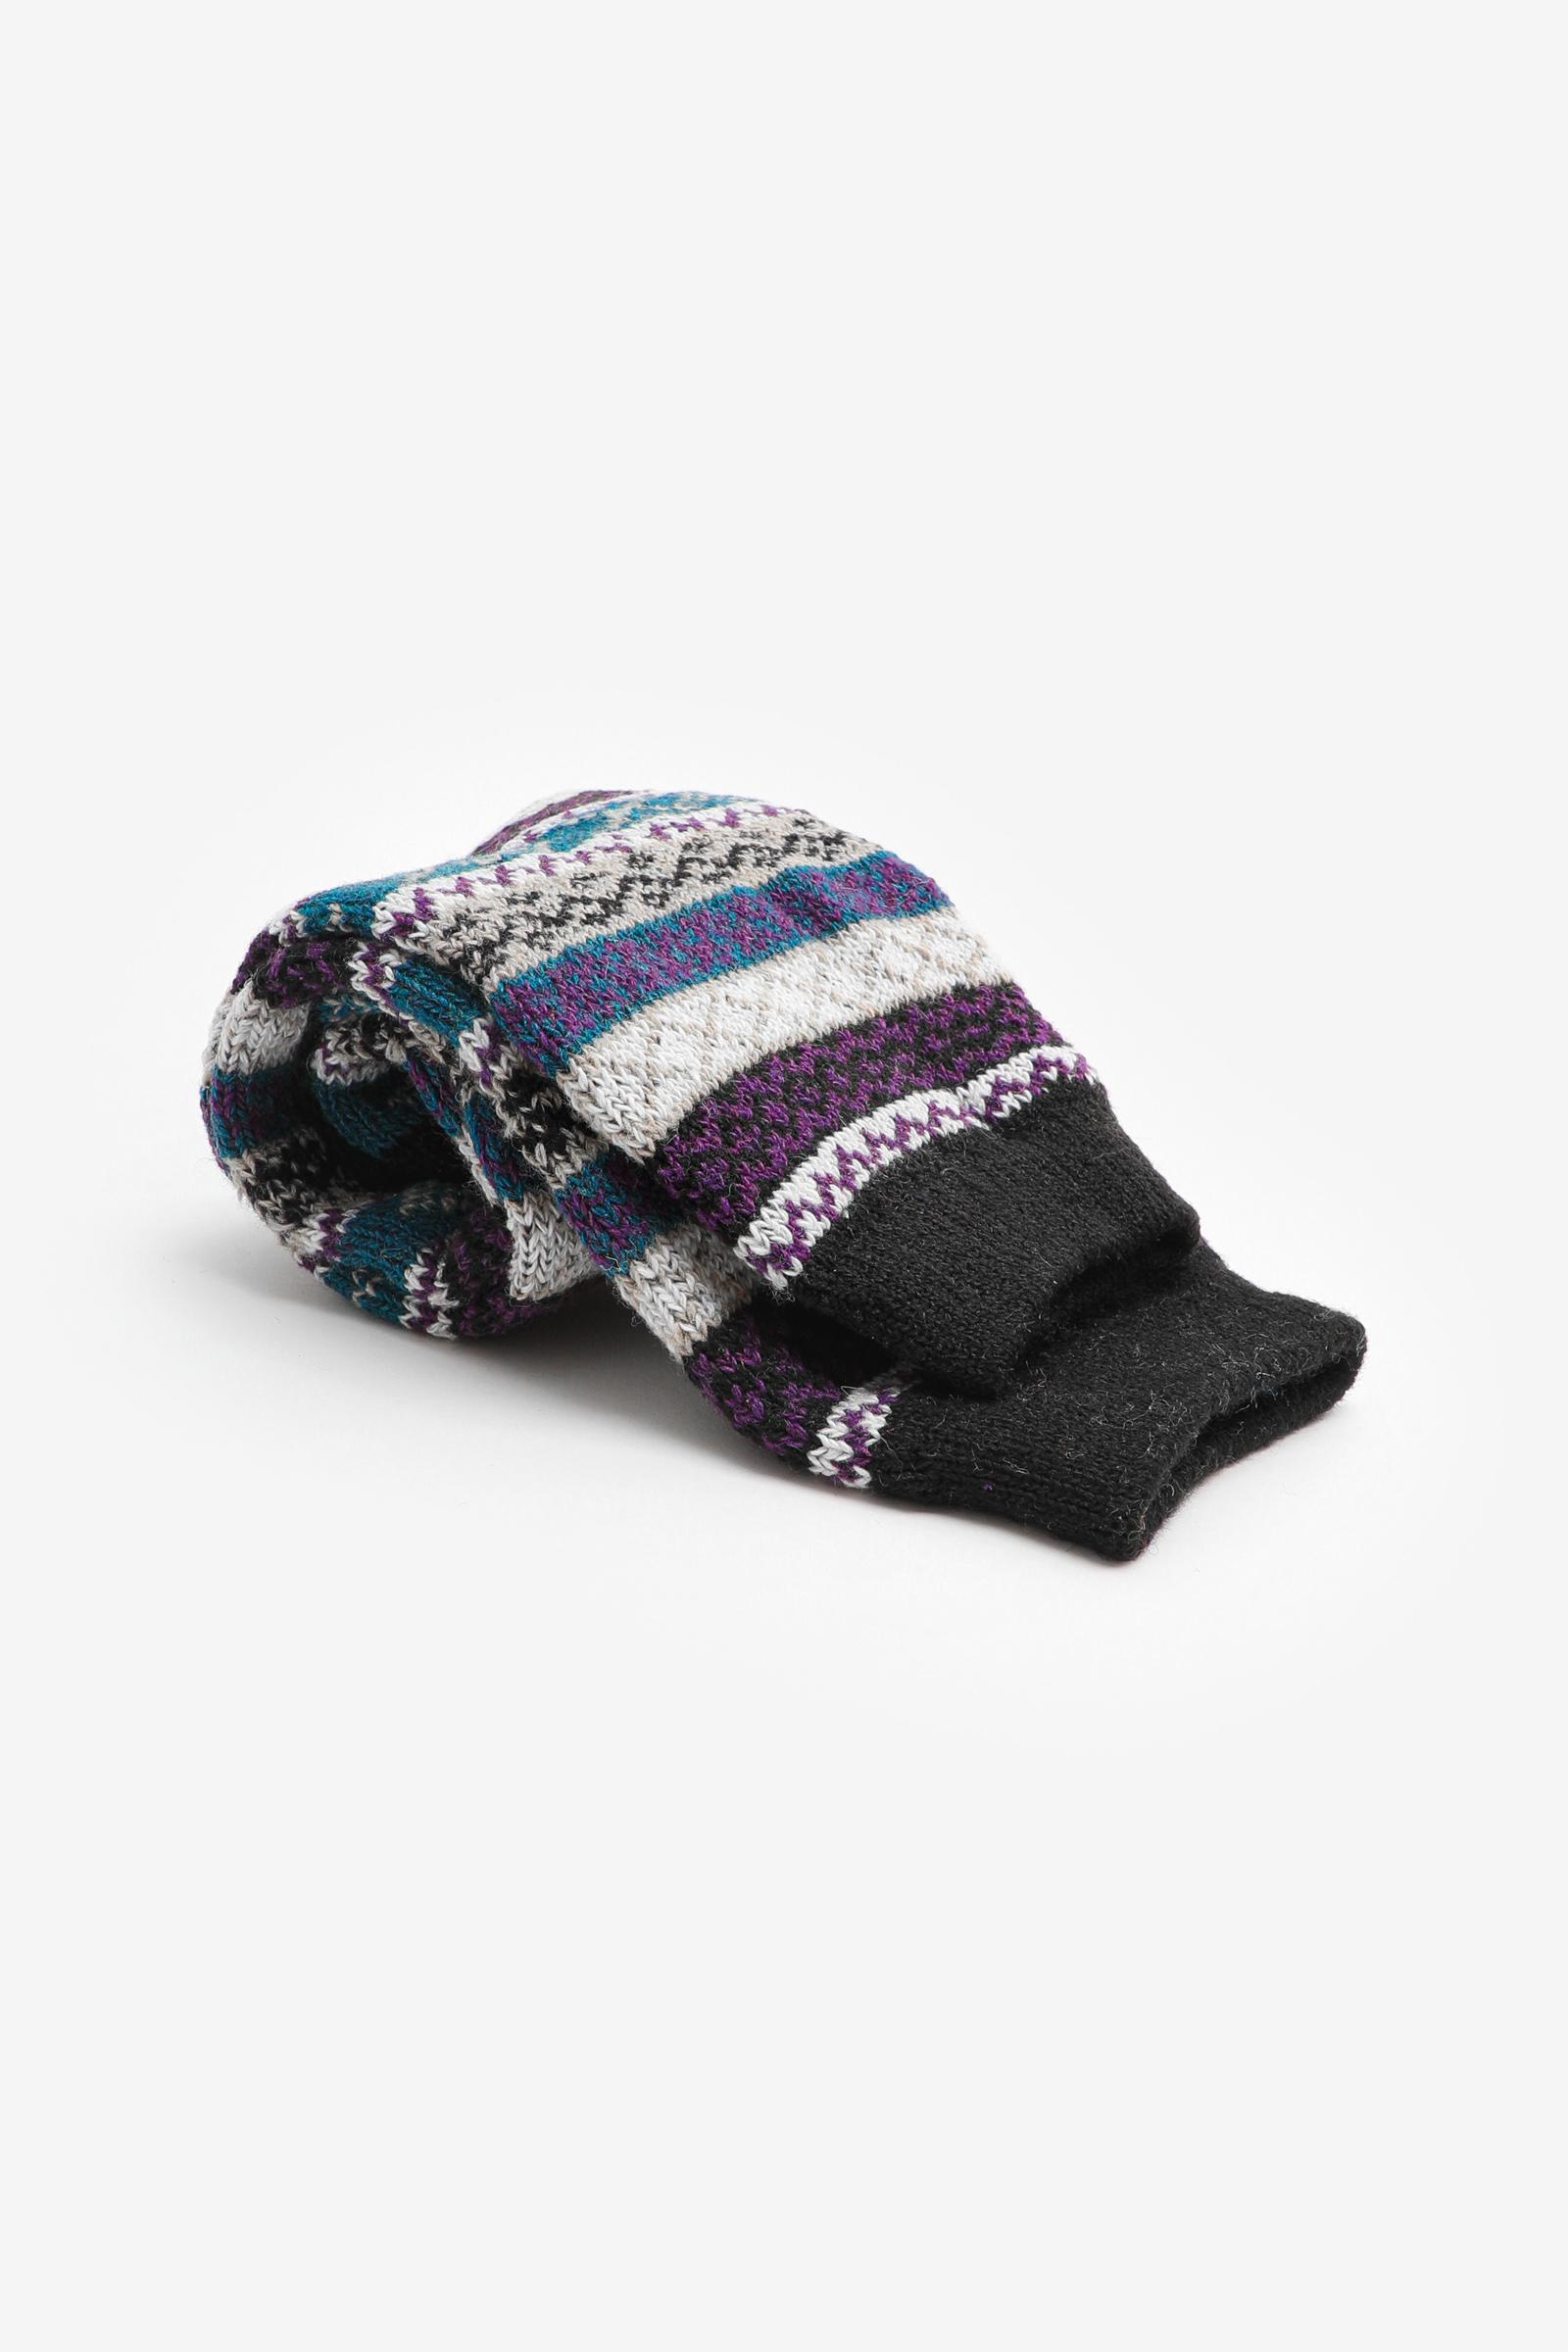 Fair Isle Cabin Socks